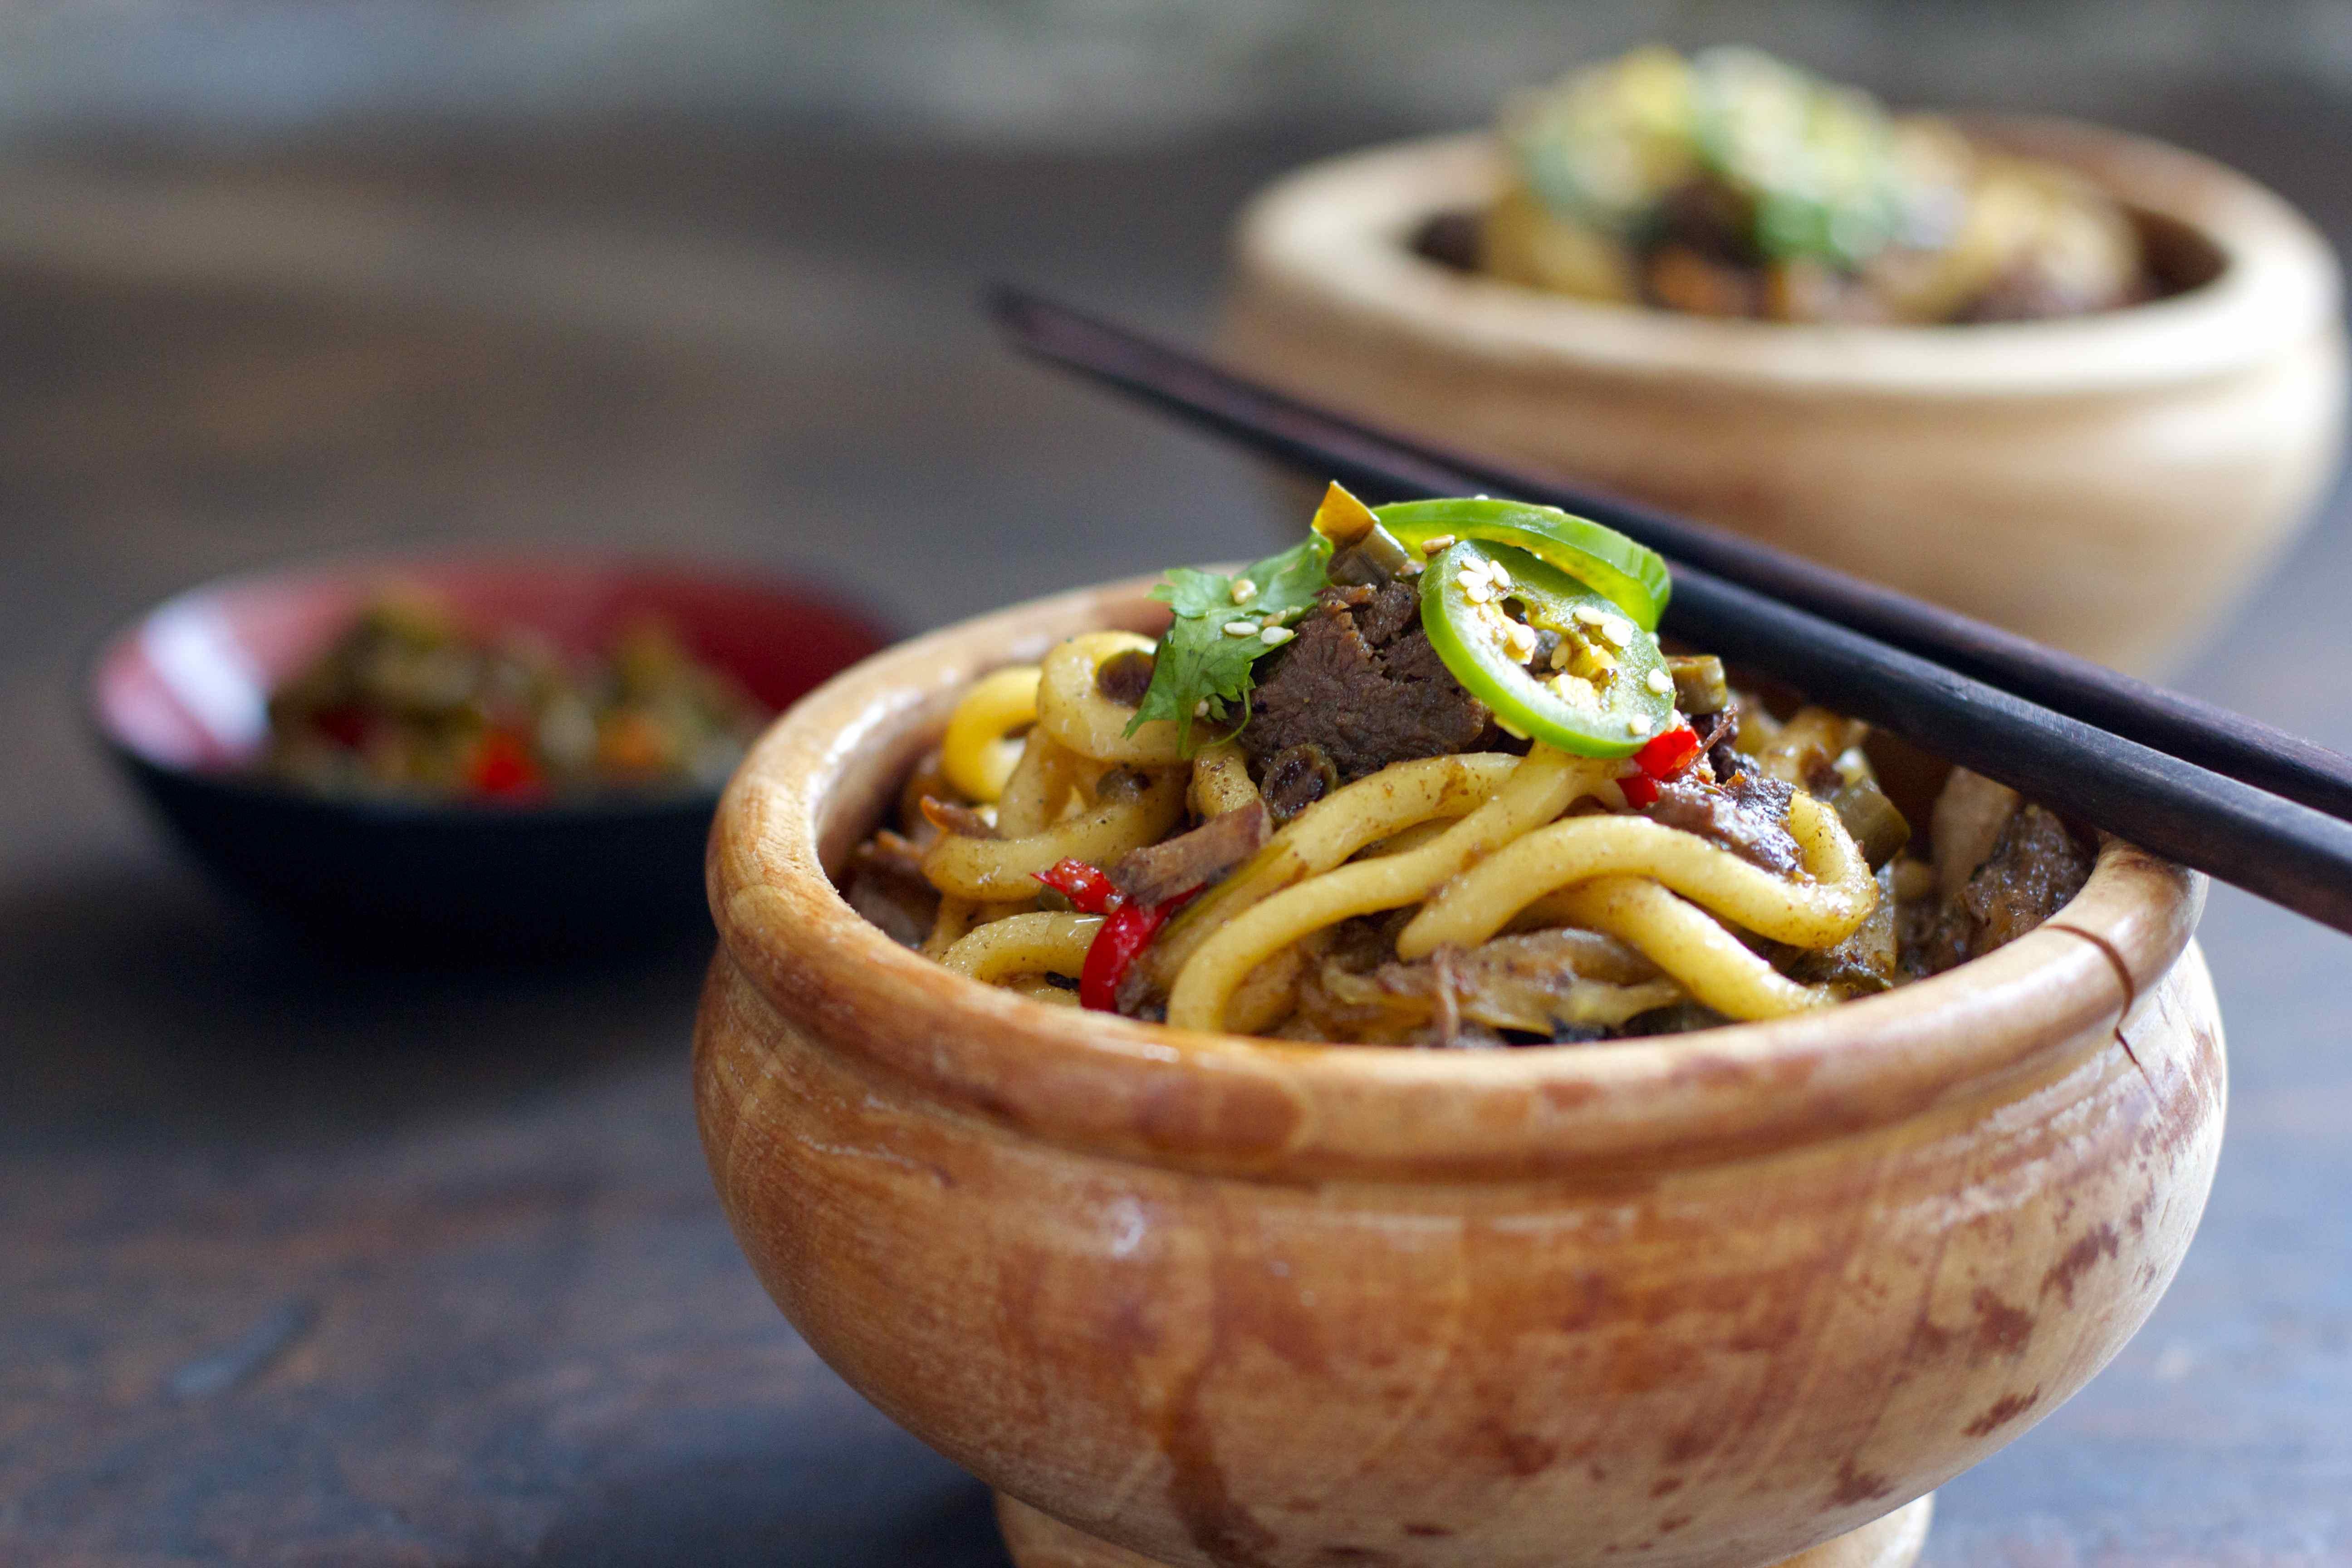 Eden wok kosher chinese cuisine sushi new york ny forumfinder Gallery